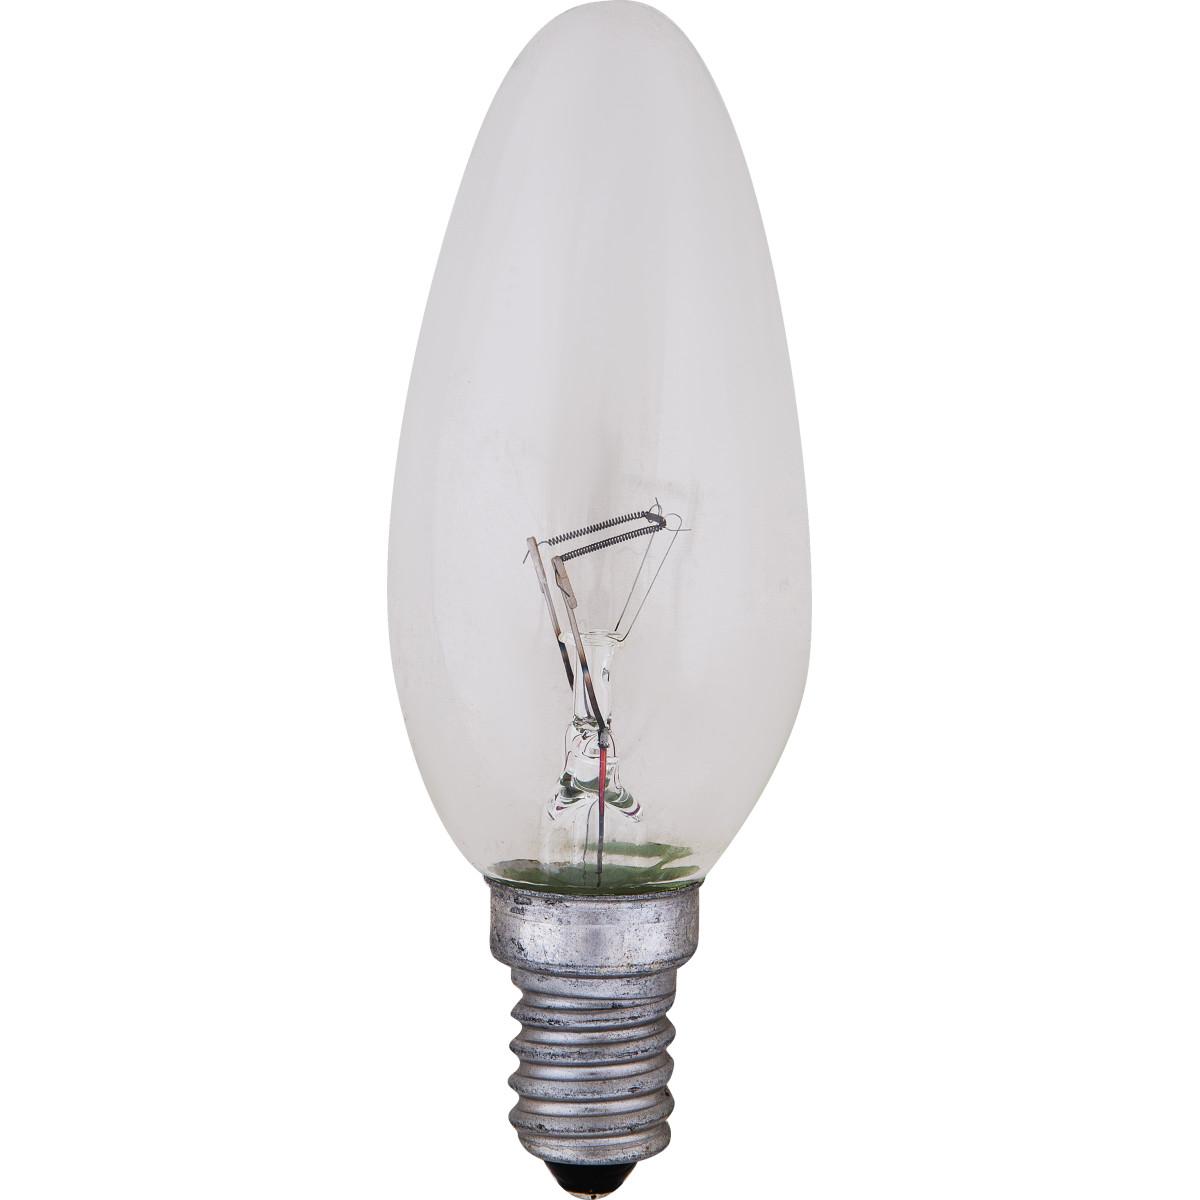 Лампа накаливания Radium Свеча E14 40 Вт прозрачная колба